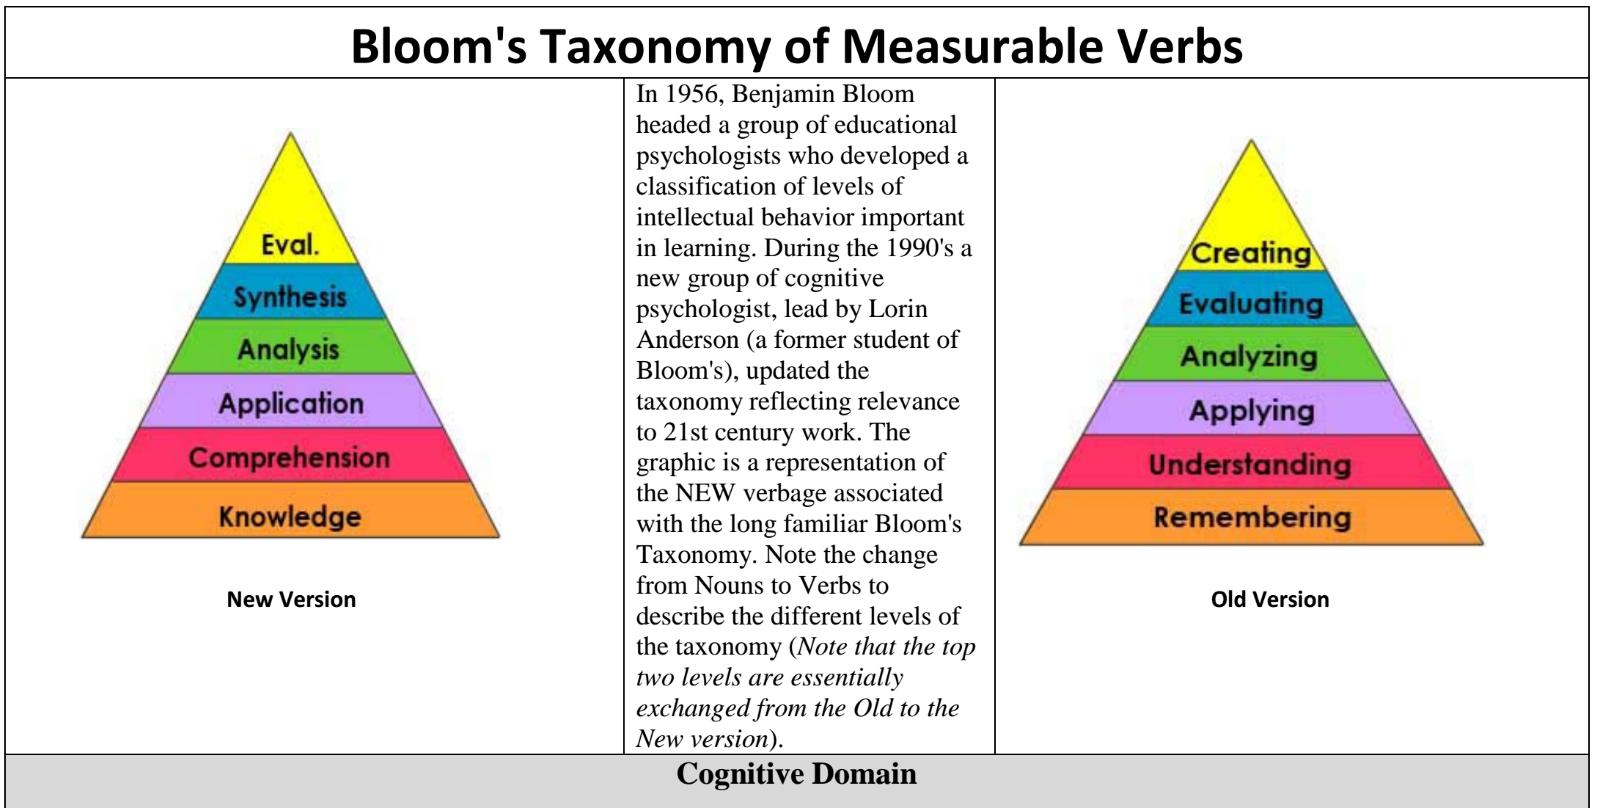 benjamin blooms cognitive taxonomy